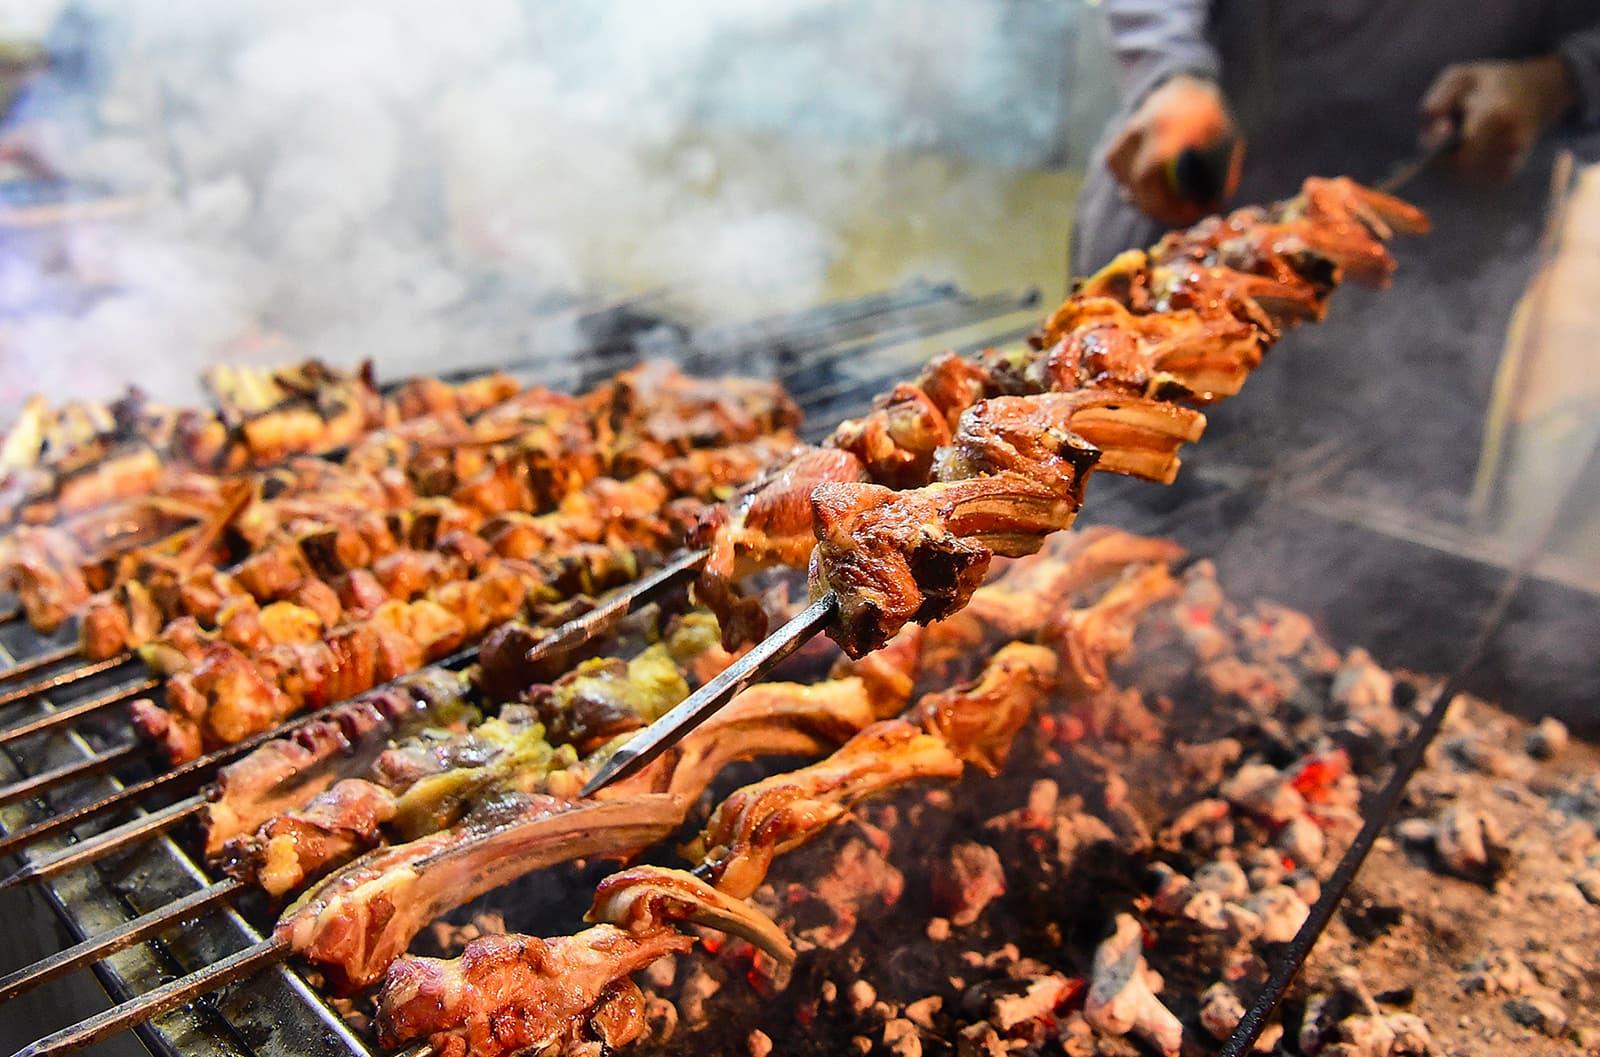 A Pakistani man cooks grilled meat at the Charsi Tikka restaurant in Namak Mandi in Peshawar. — AFP